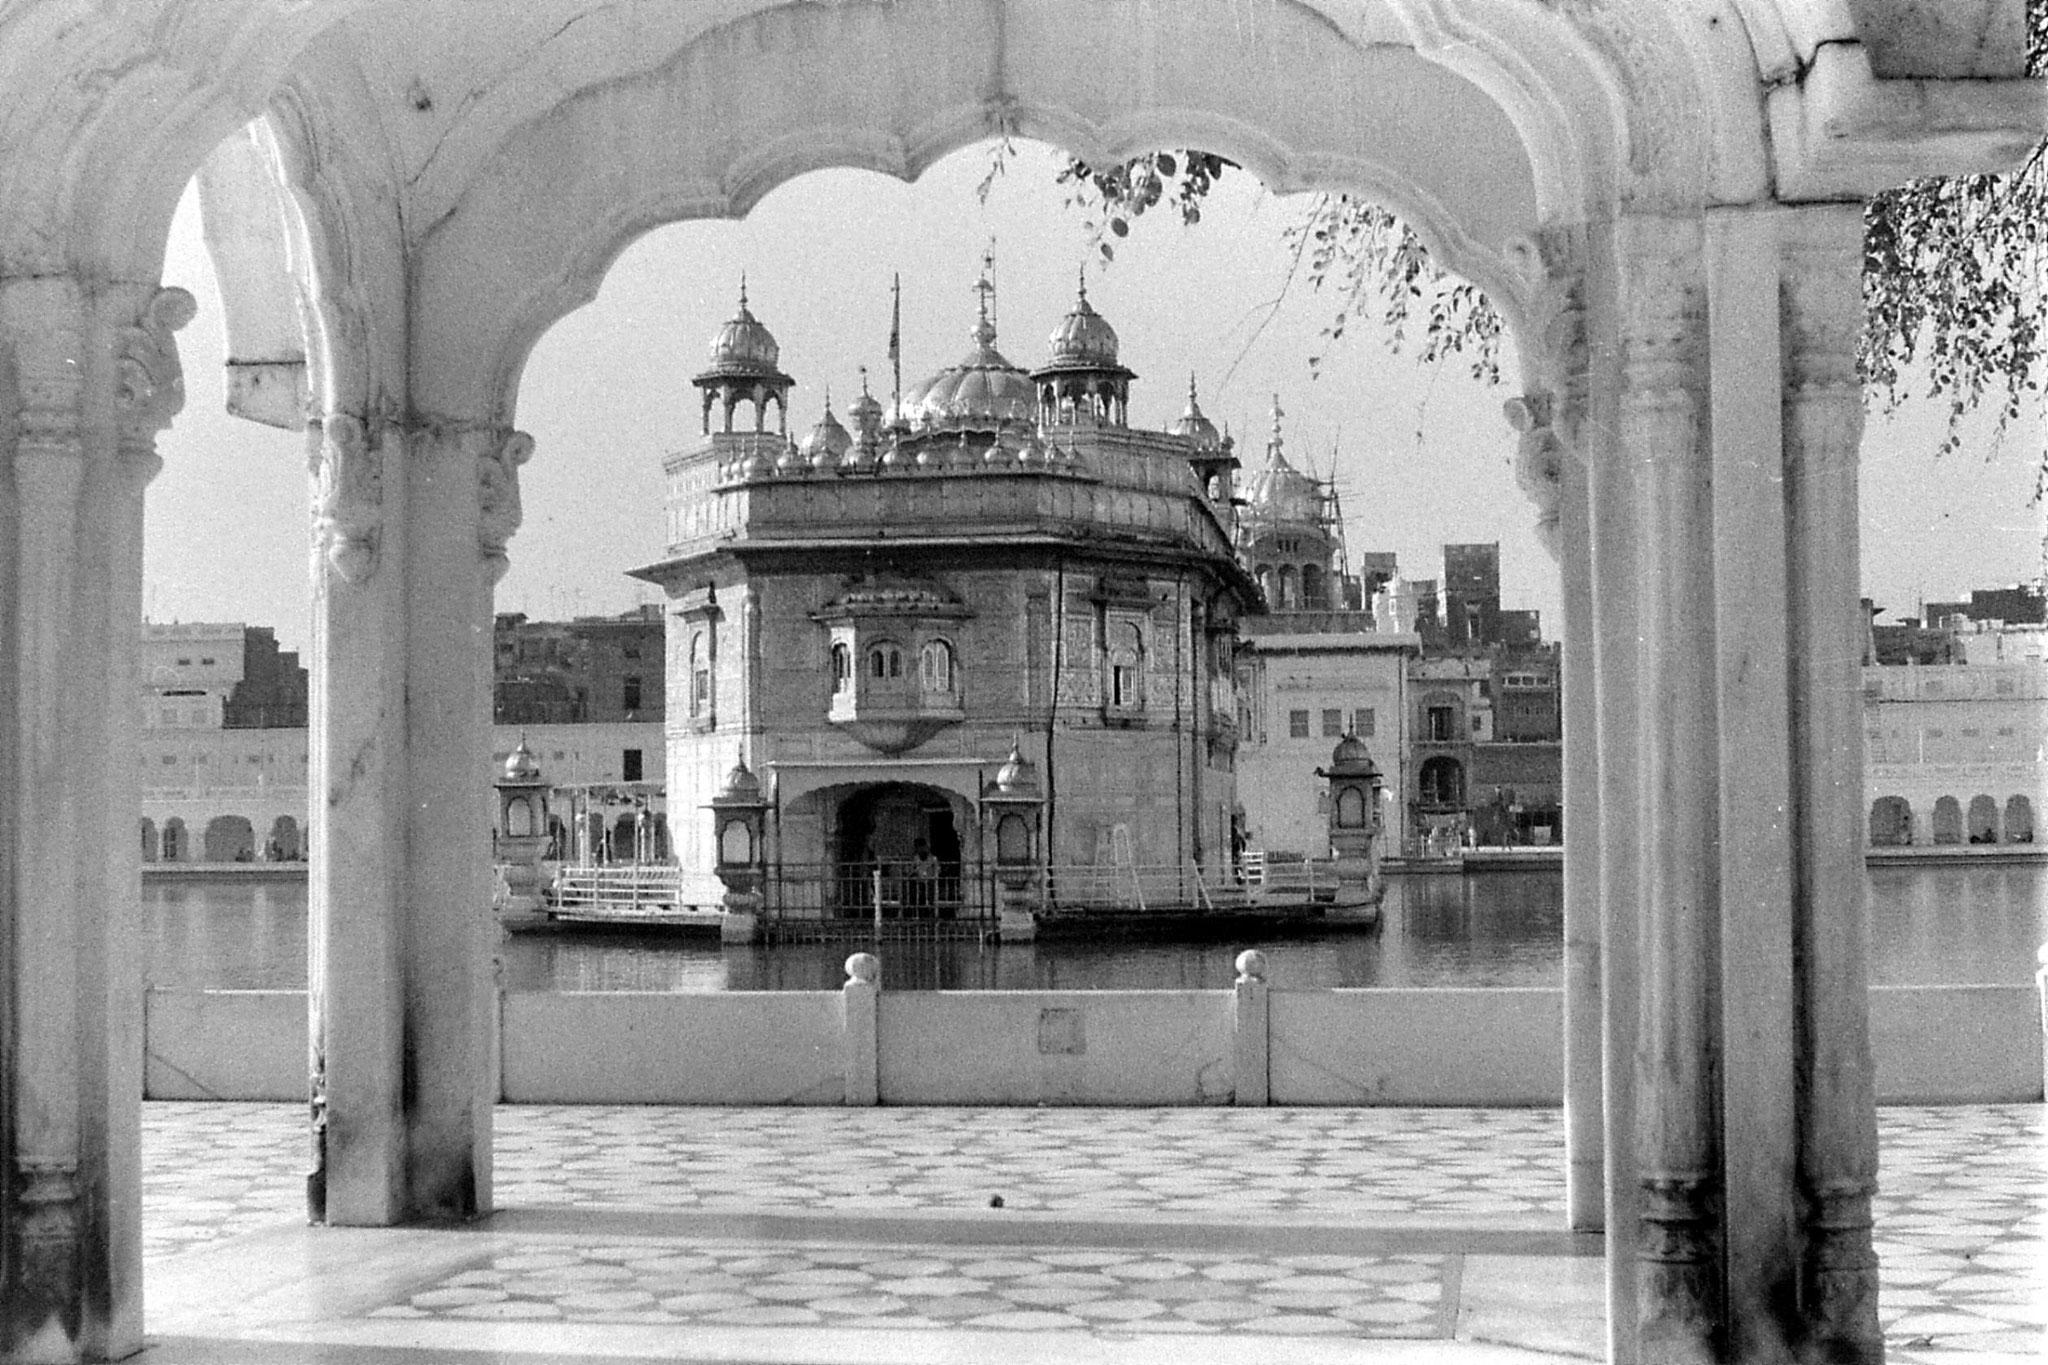 17/11/1989: 5: Amritsar Golden Temple